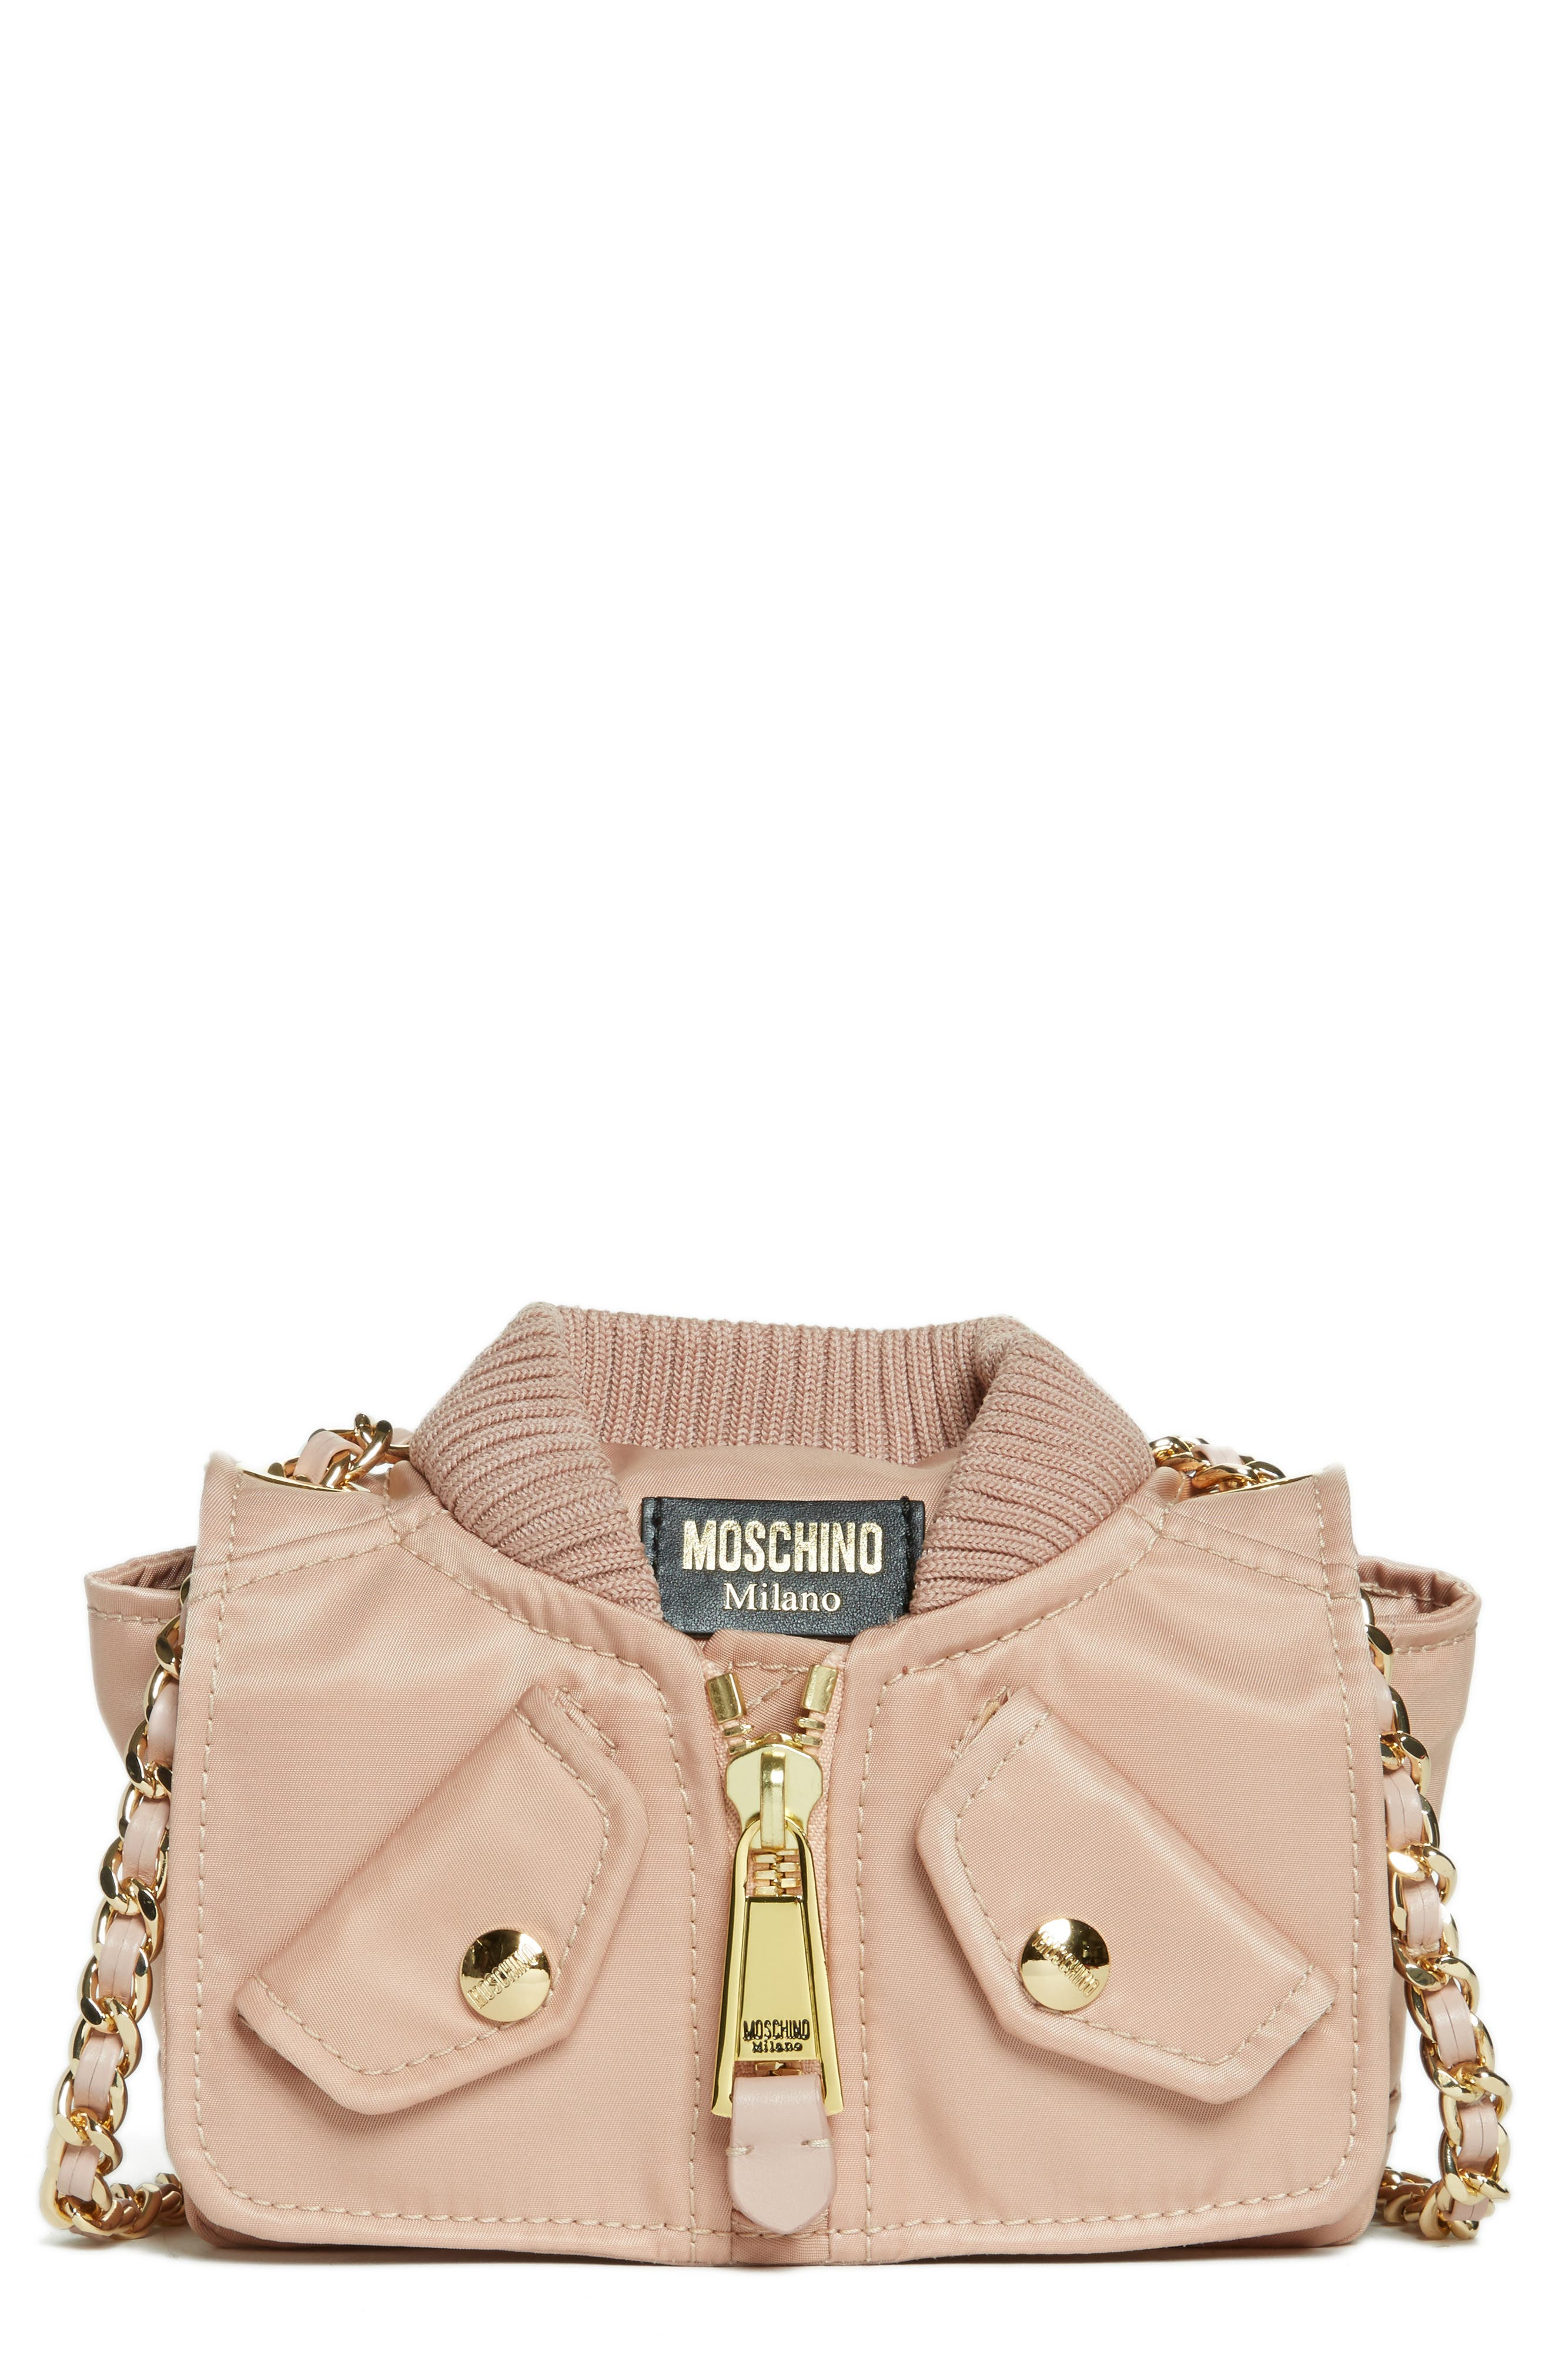 Small Biker Jacket Nylon Shoulder Bag,                             Main thumbnail 1, color,                             683